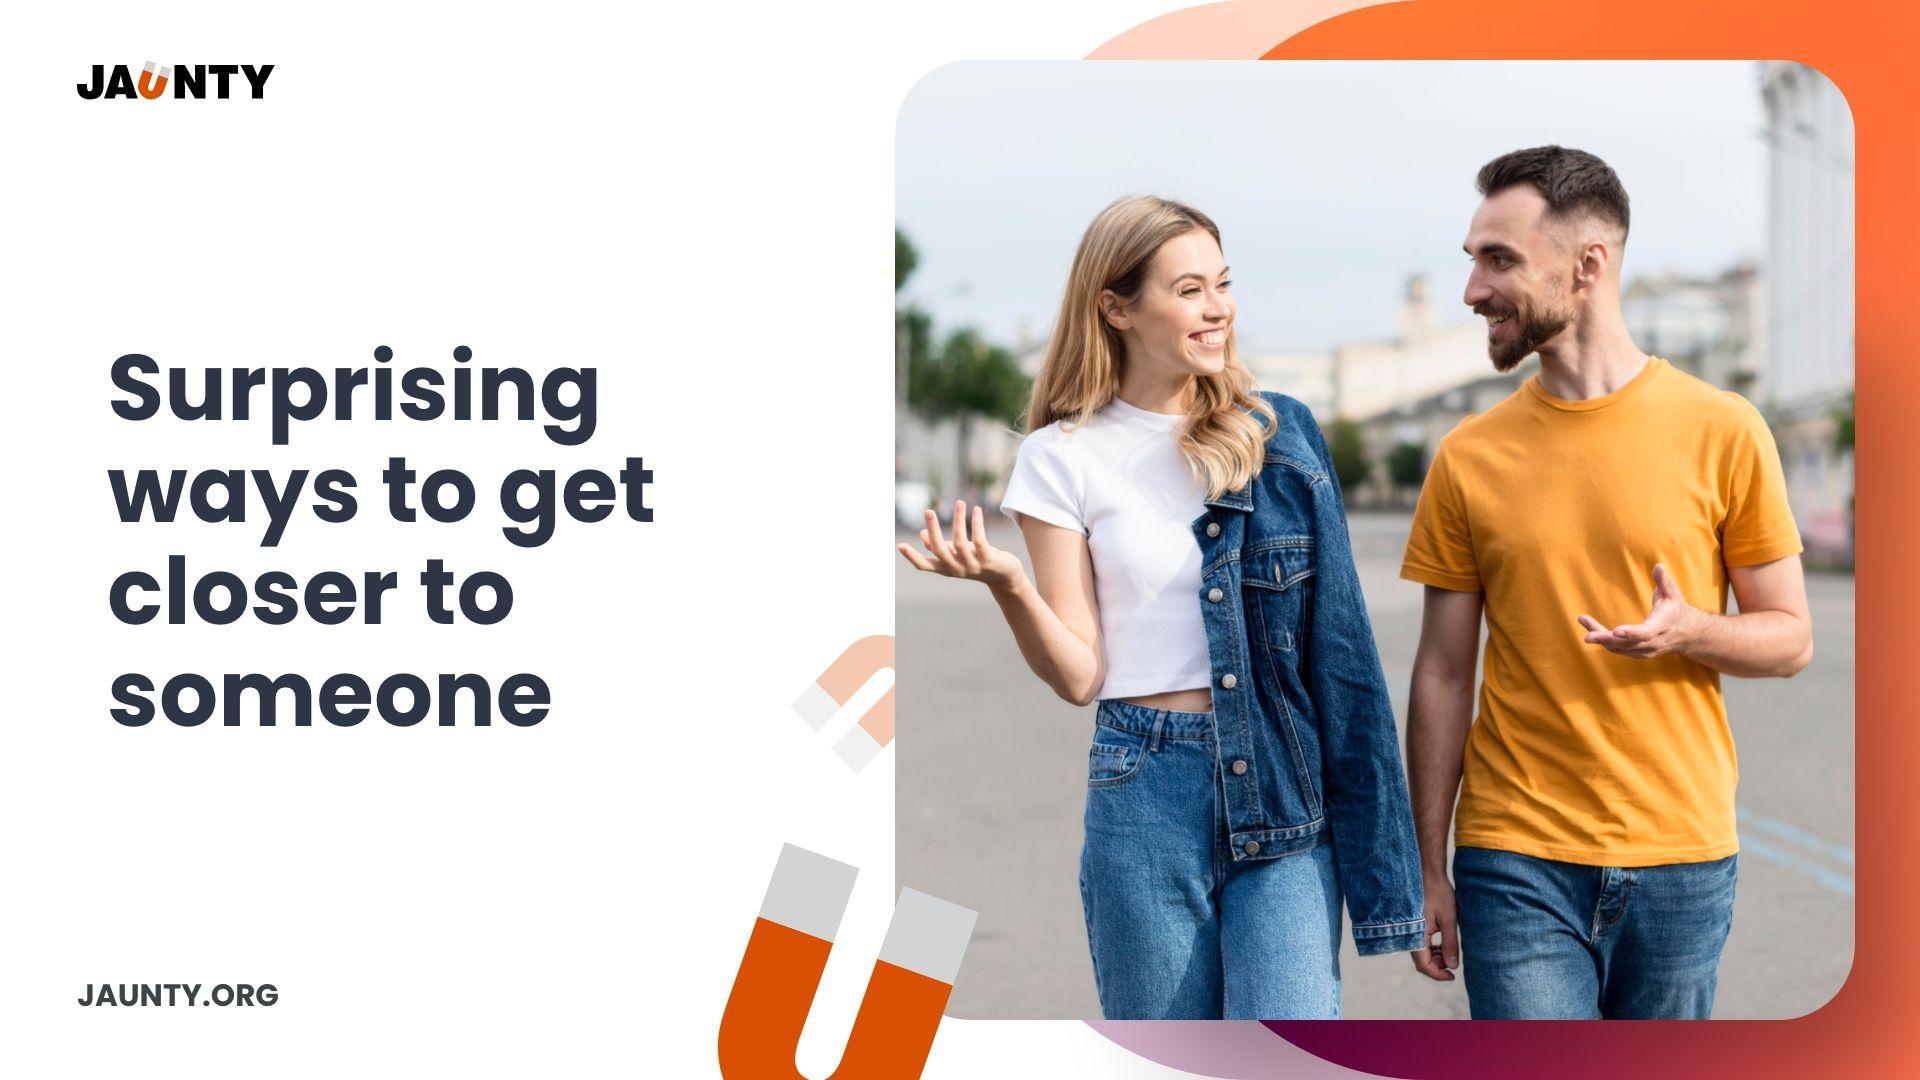 Surprising ways to get closer to someone